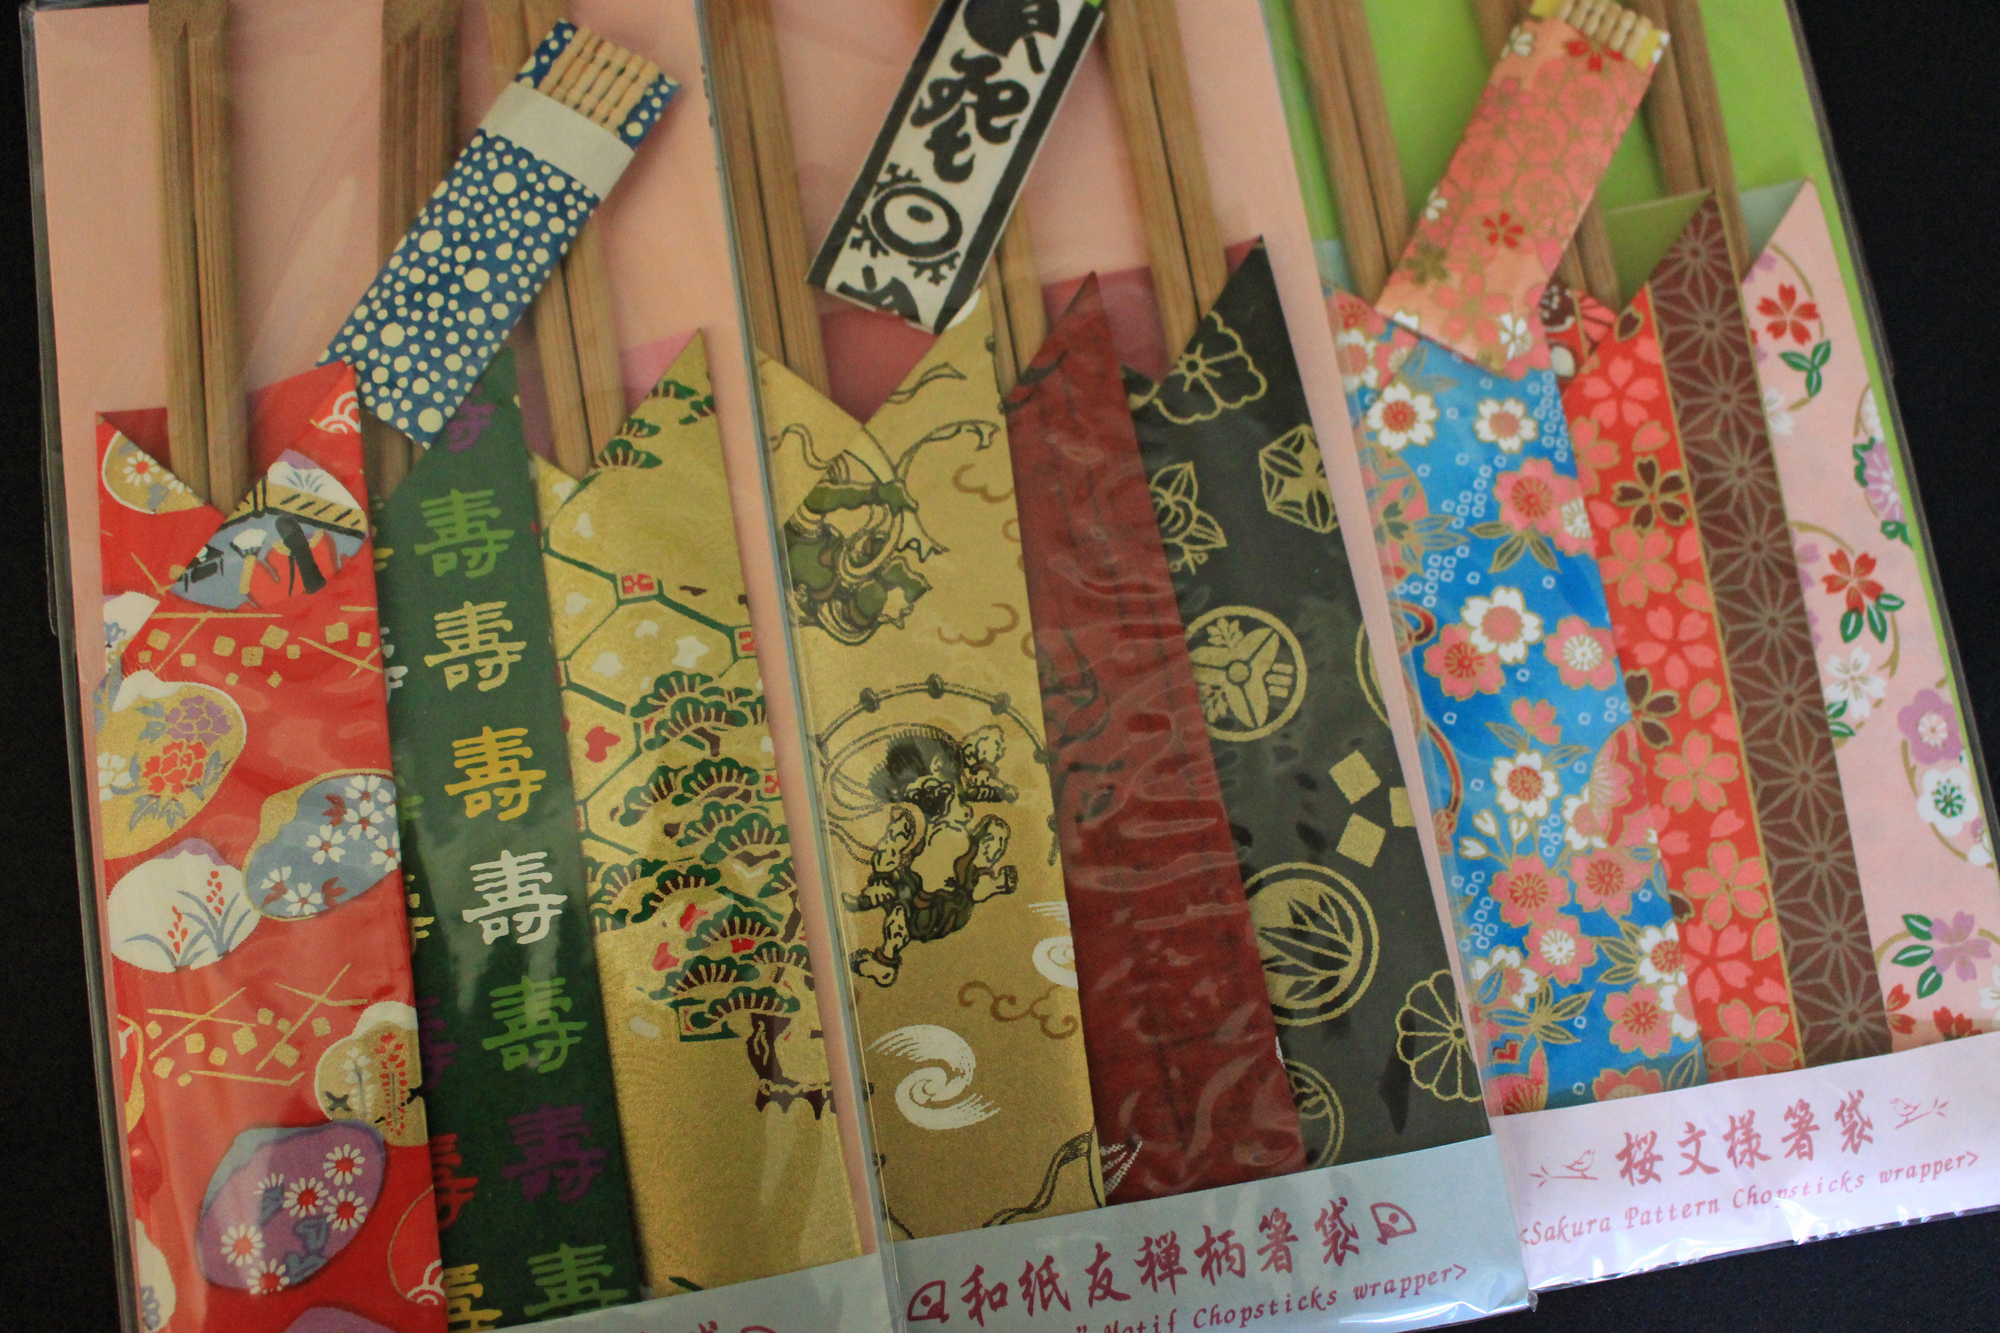 和紙友禅柄箸袋No.2 3本×3セット